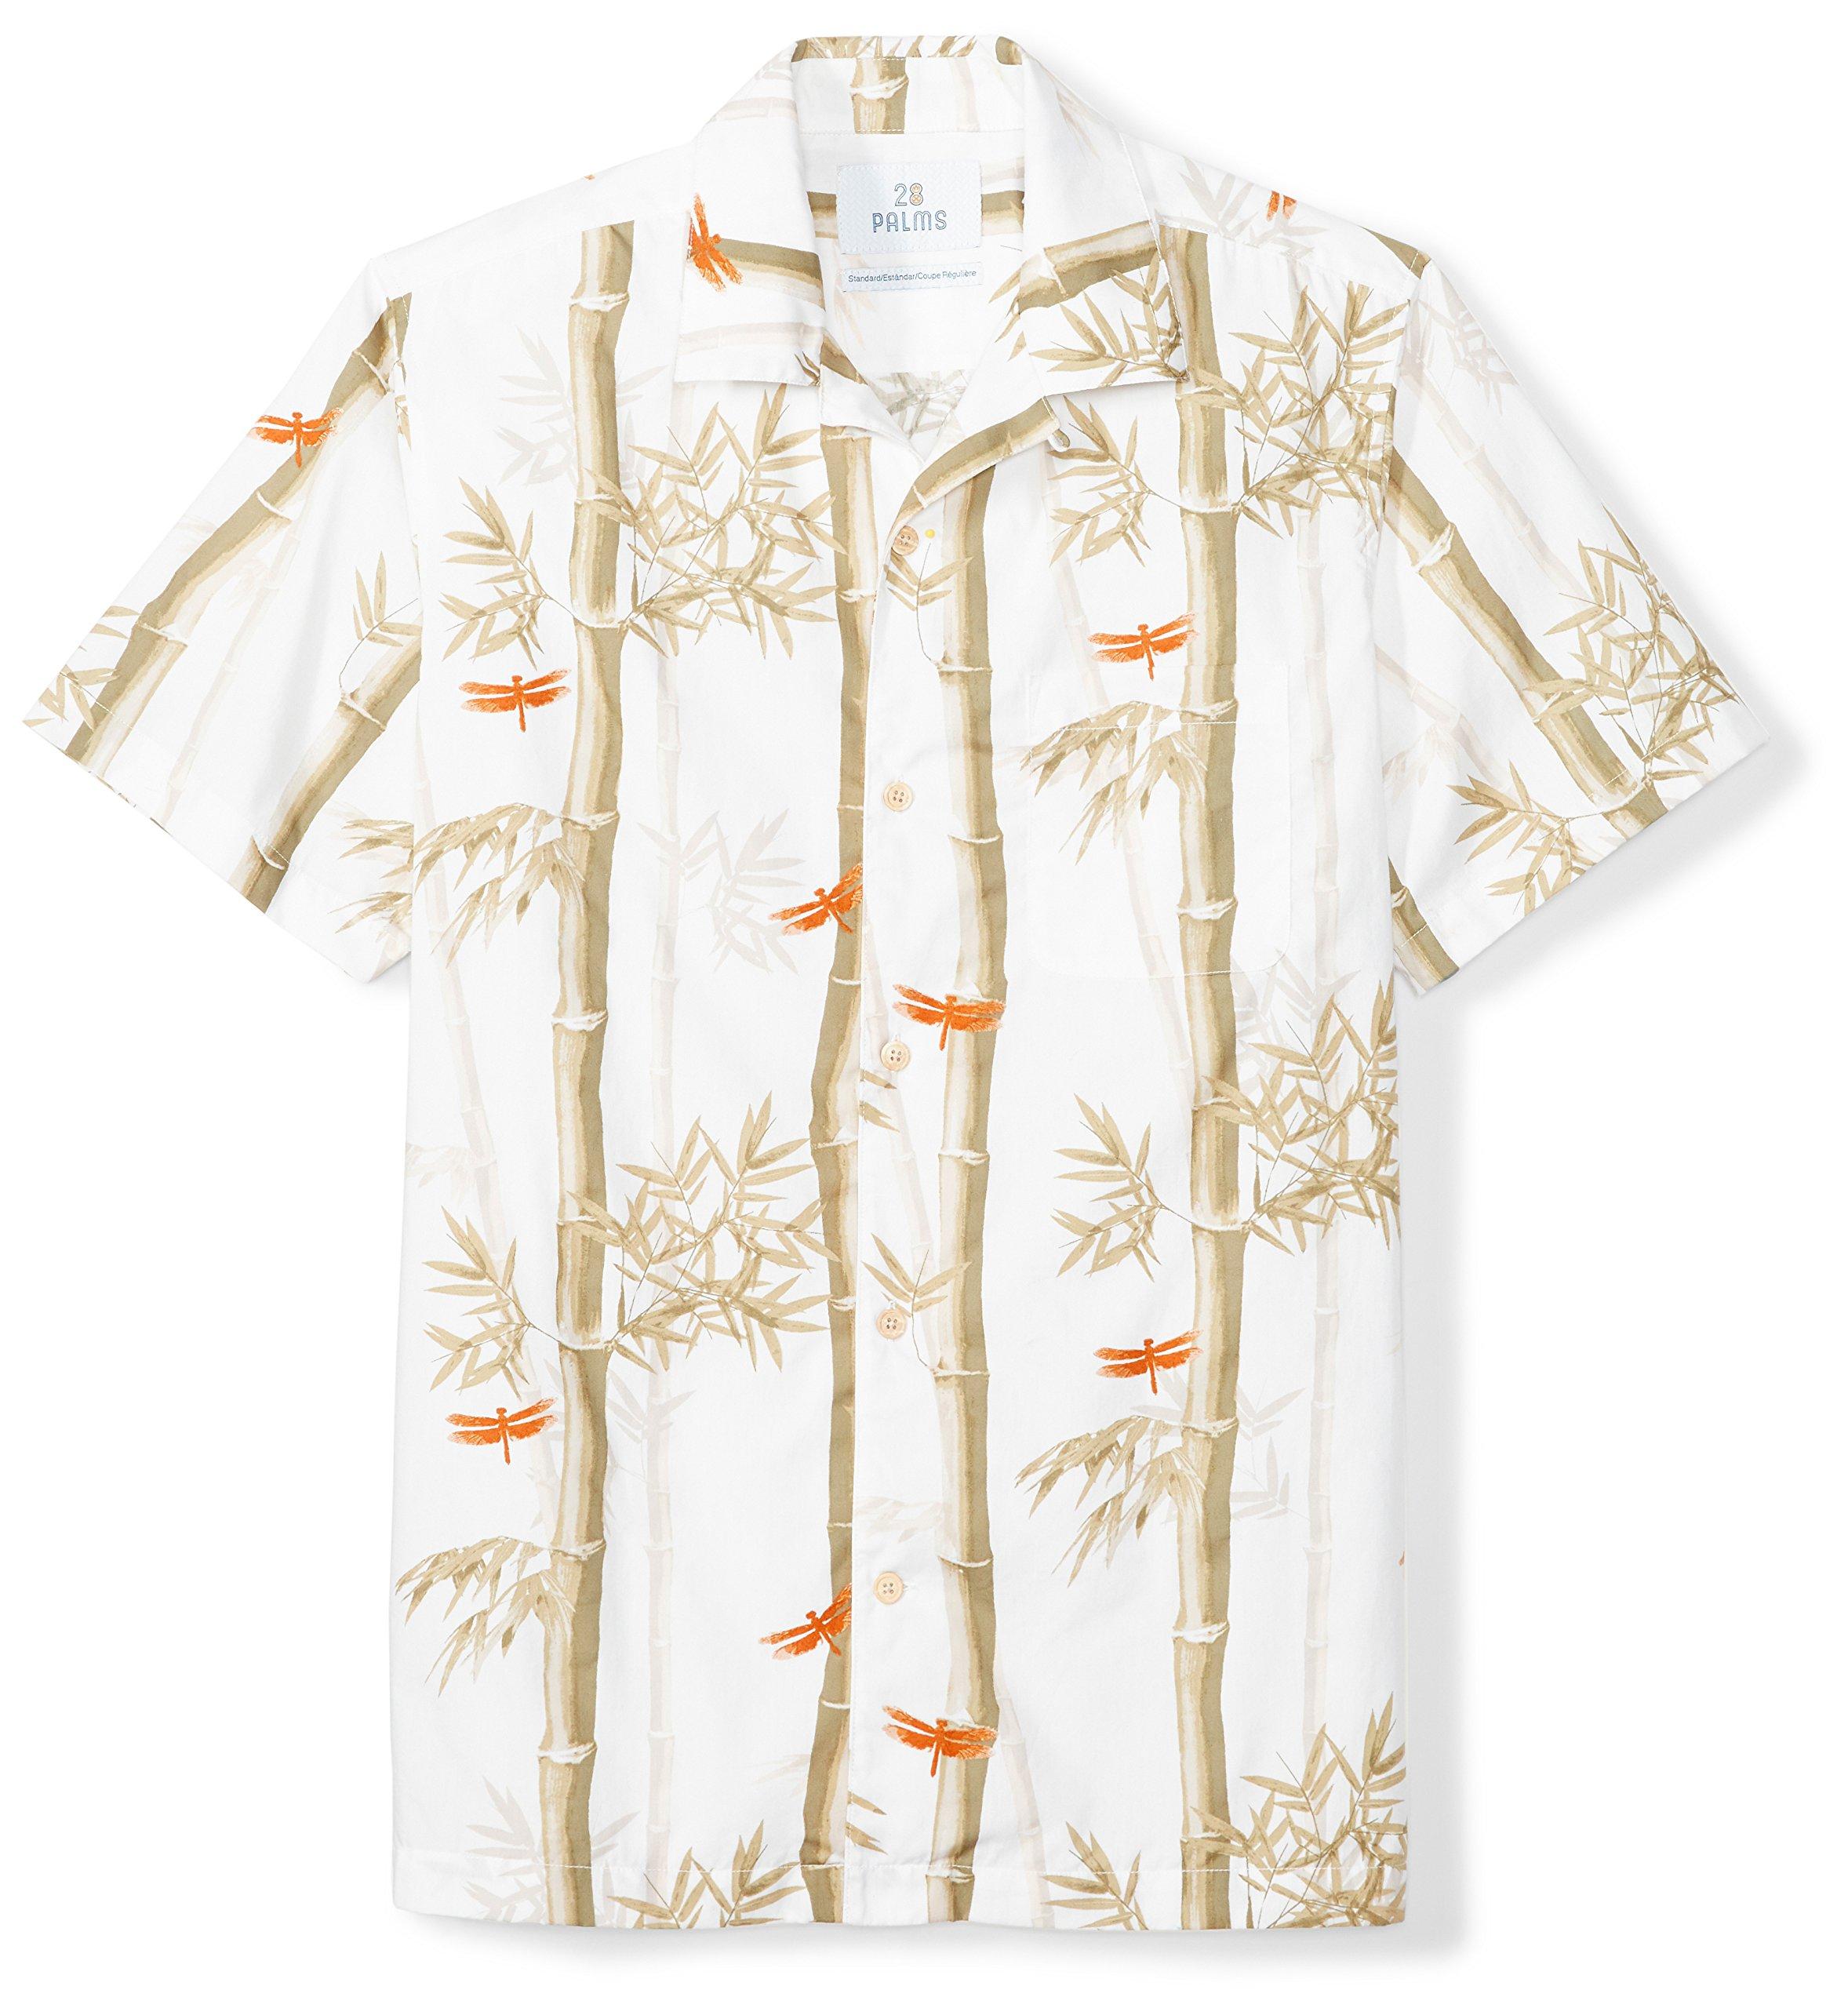 d6dec332 Galleon - 28 Palms Men's Standard-Fit 100% Cotton Tropical Hawaiian Shirt,  White Bamboo, Large